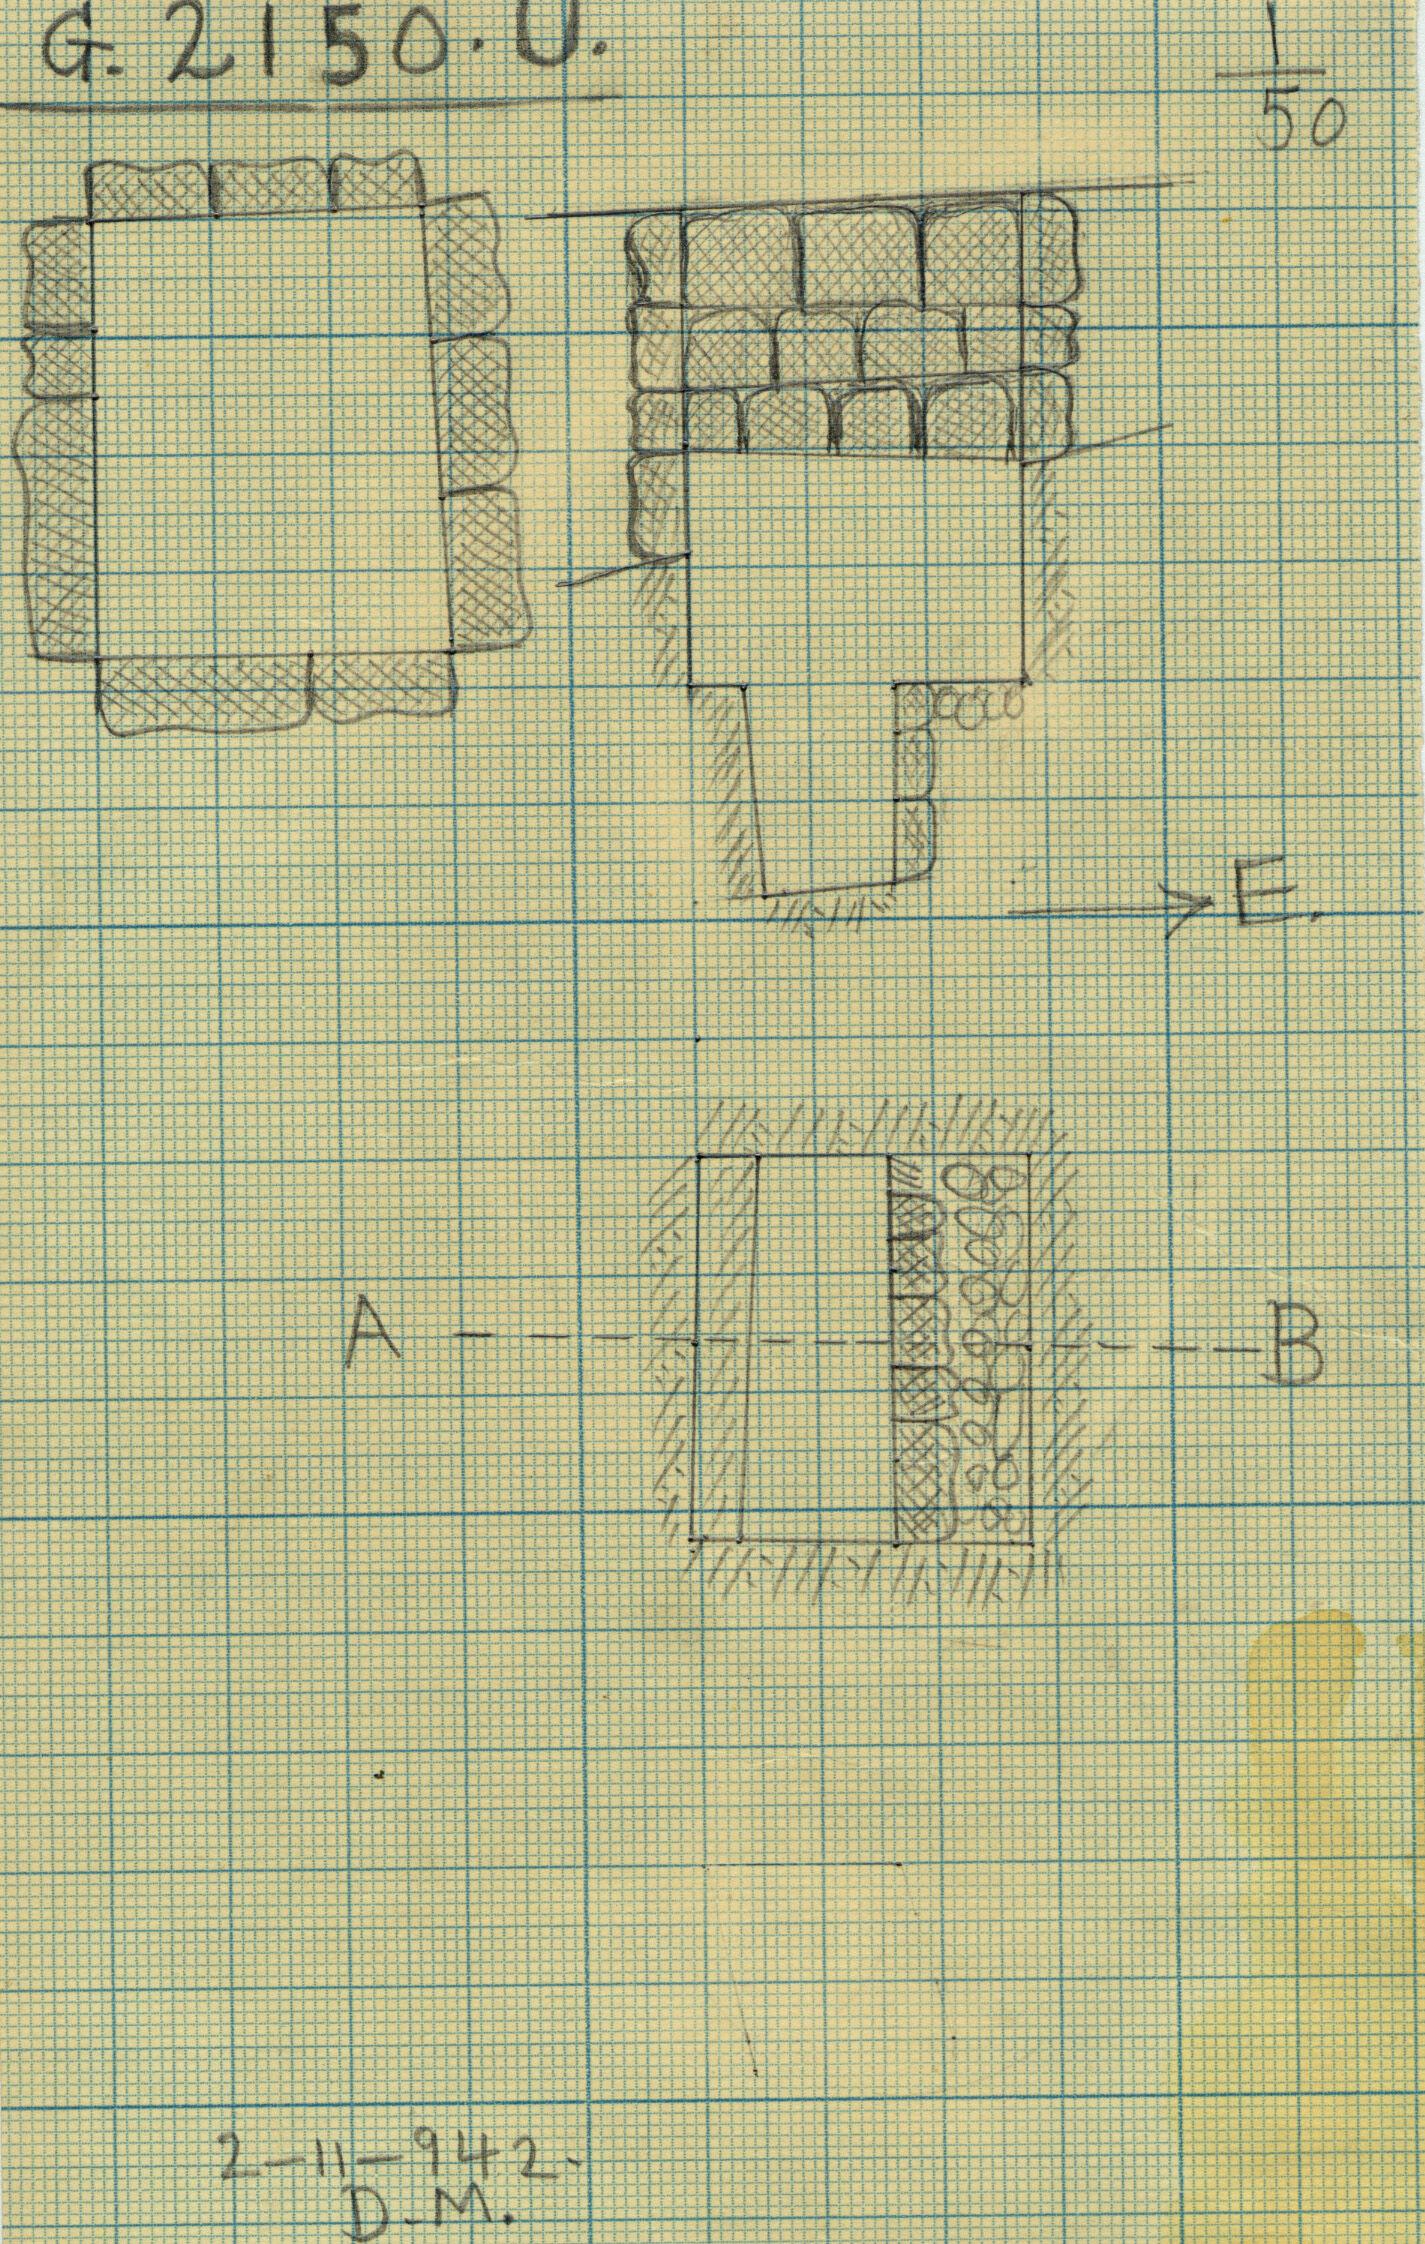 Maps and plans: G 2150, Shaft U